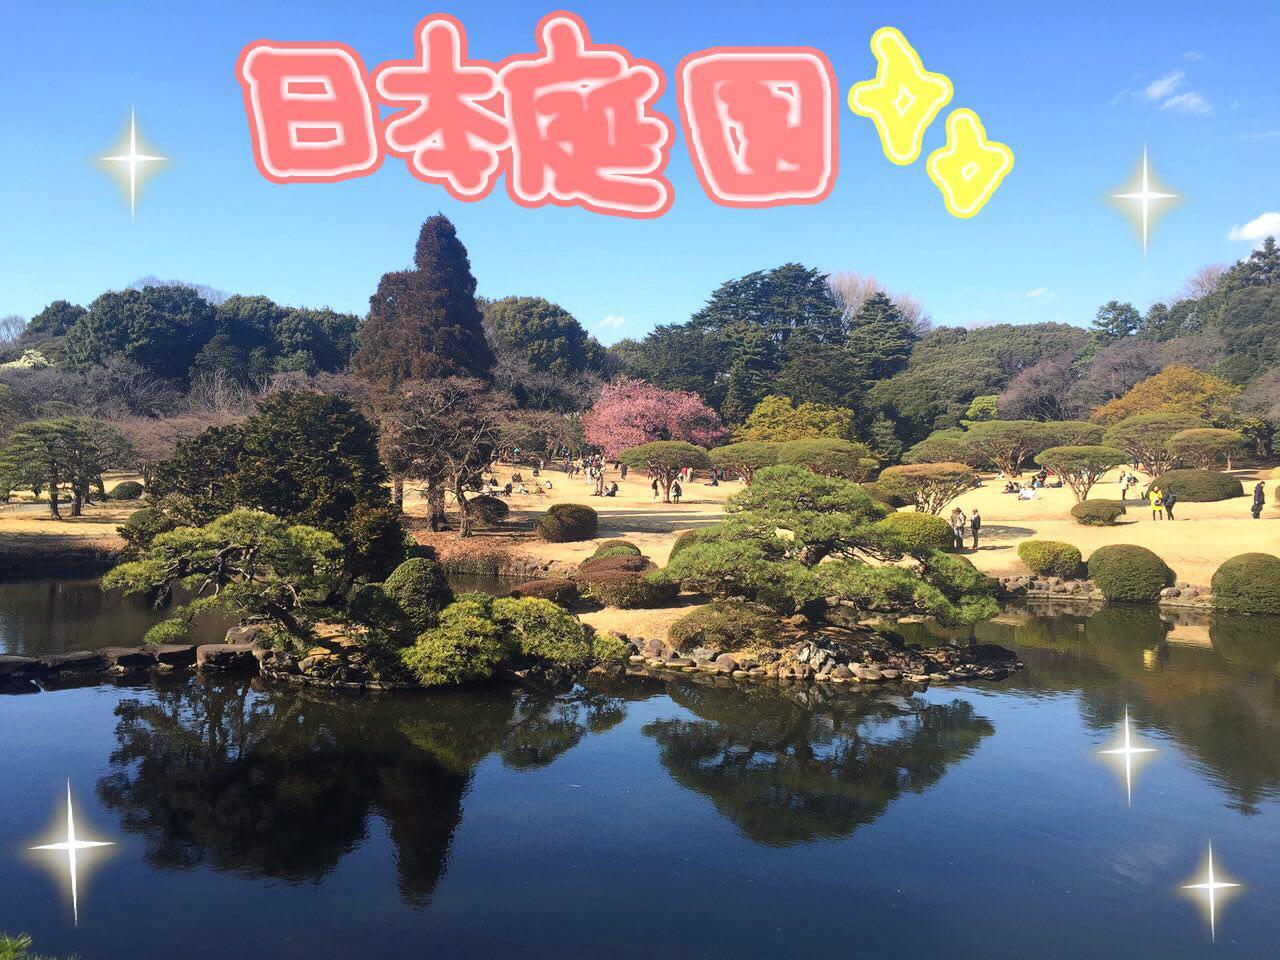 photo_2017-03-11_22-36-26.jpg